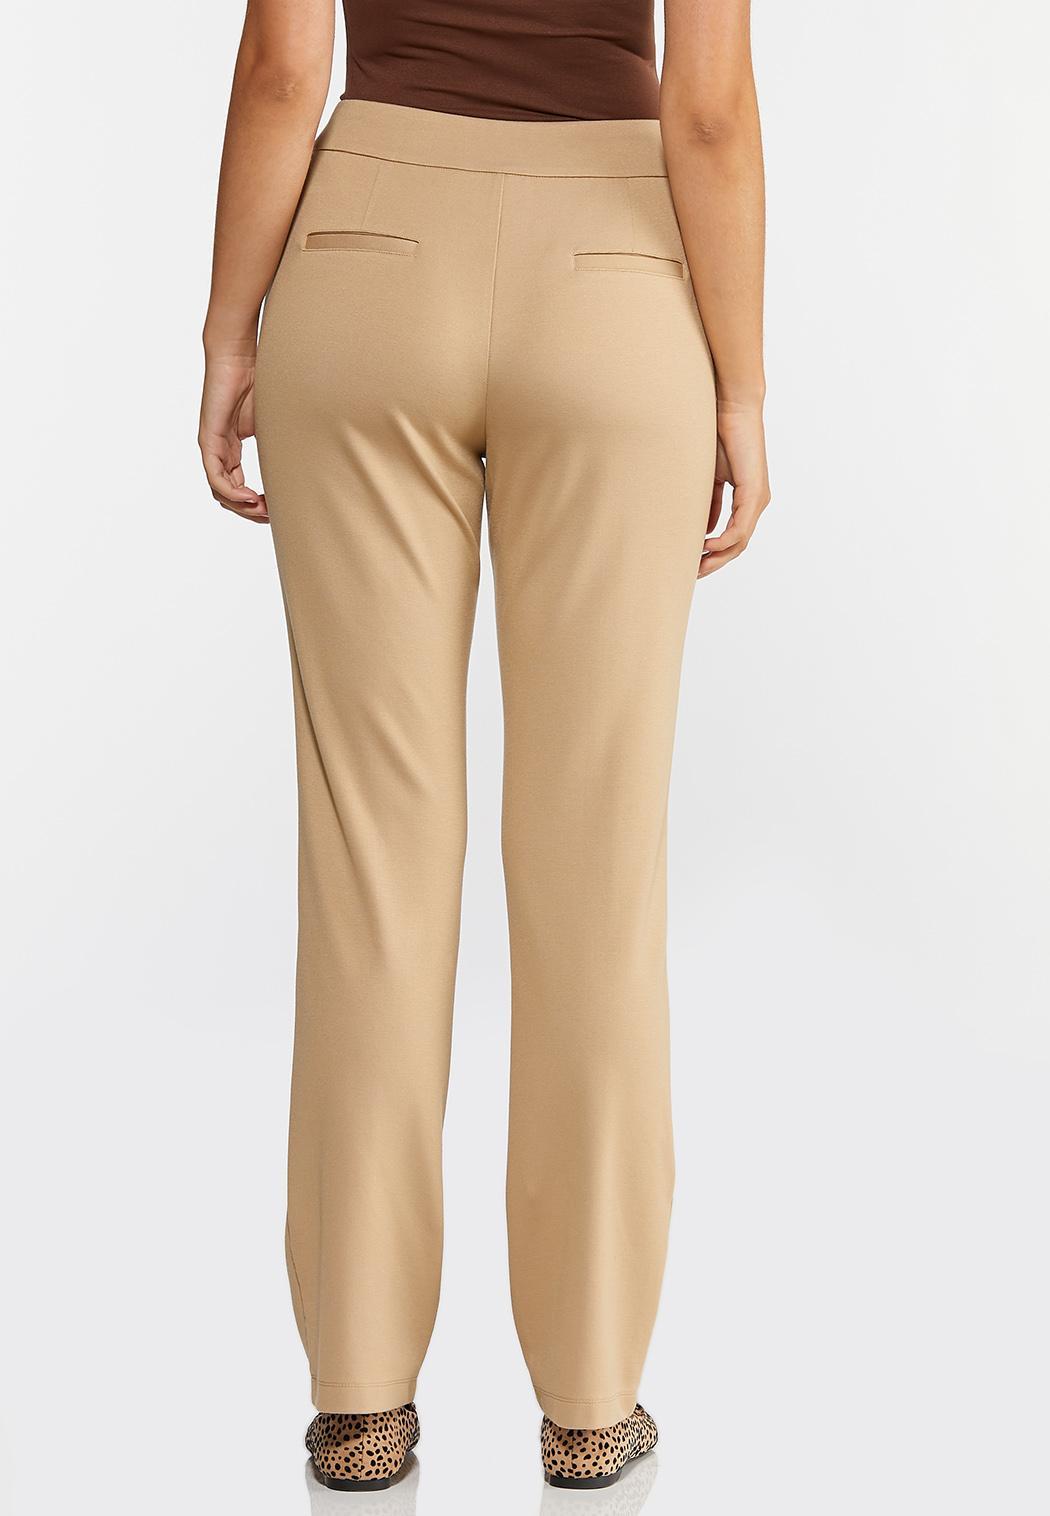 Petite Straight Leg Ponte Pants (Item #44317431)